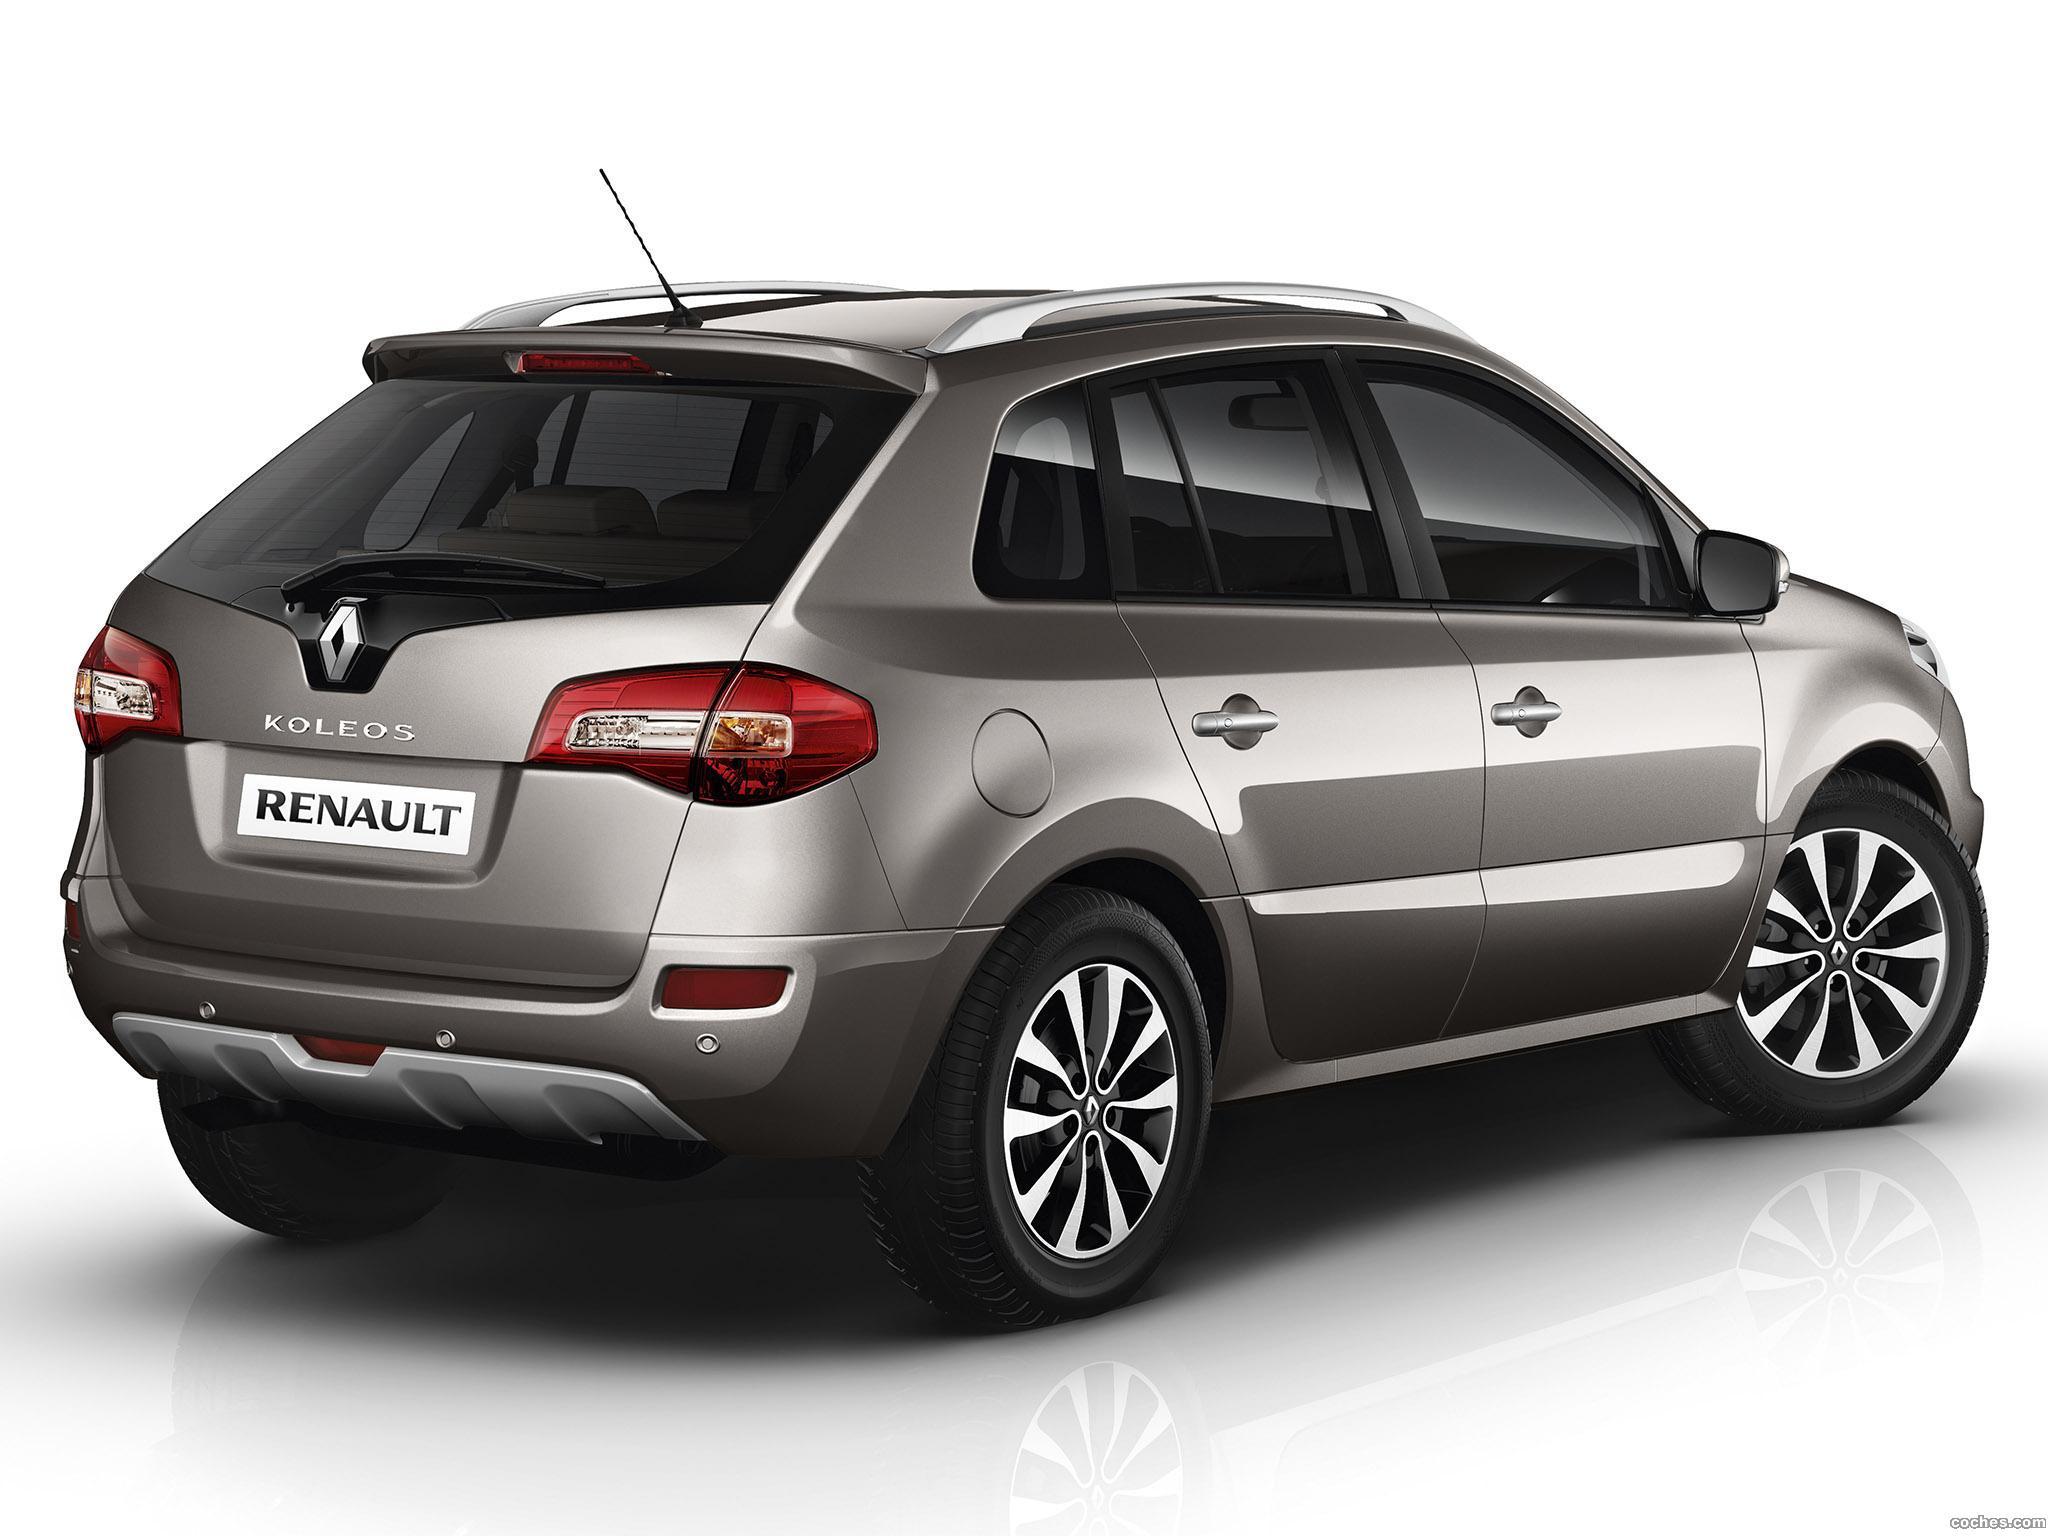 Foto 6 de Renault Koleos 2011